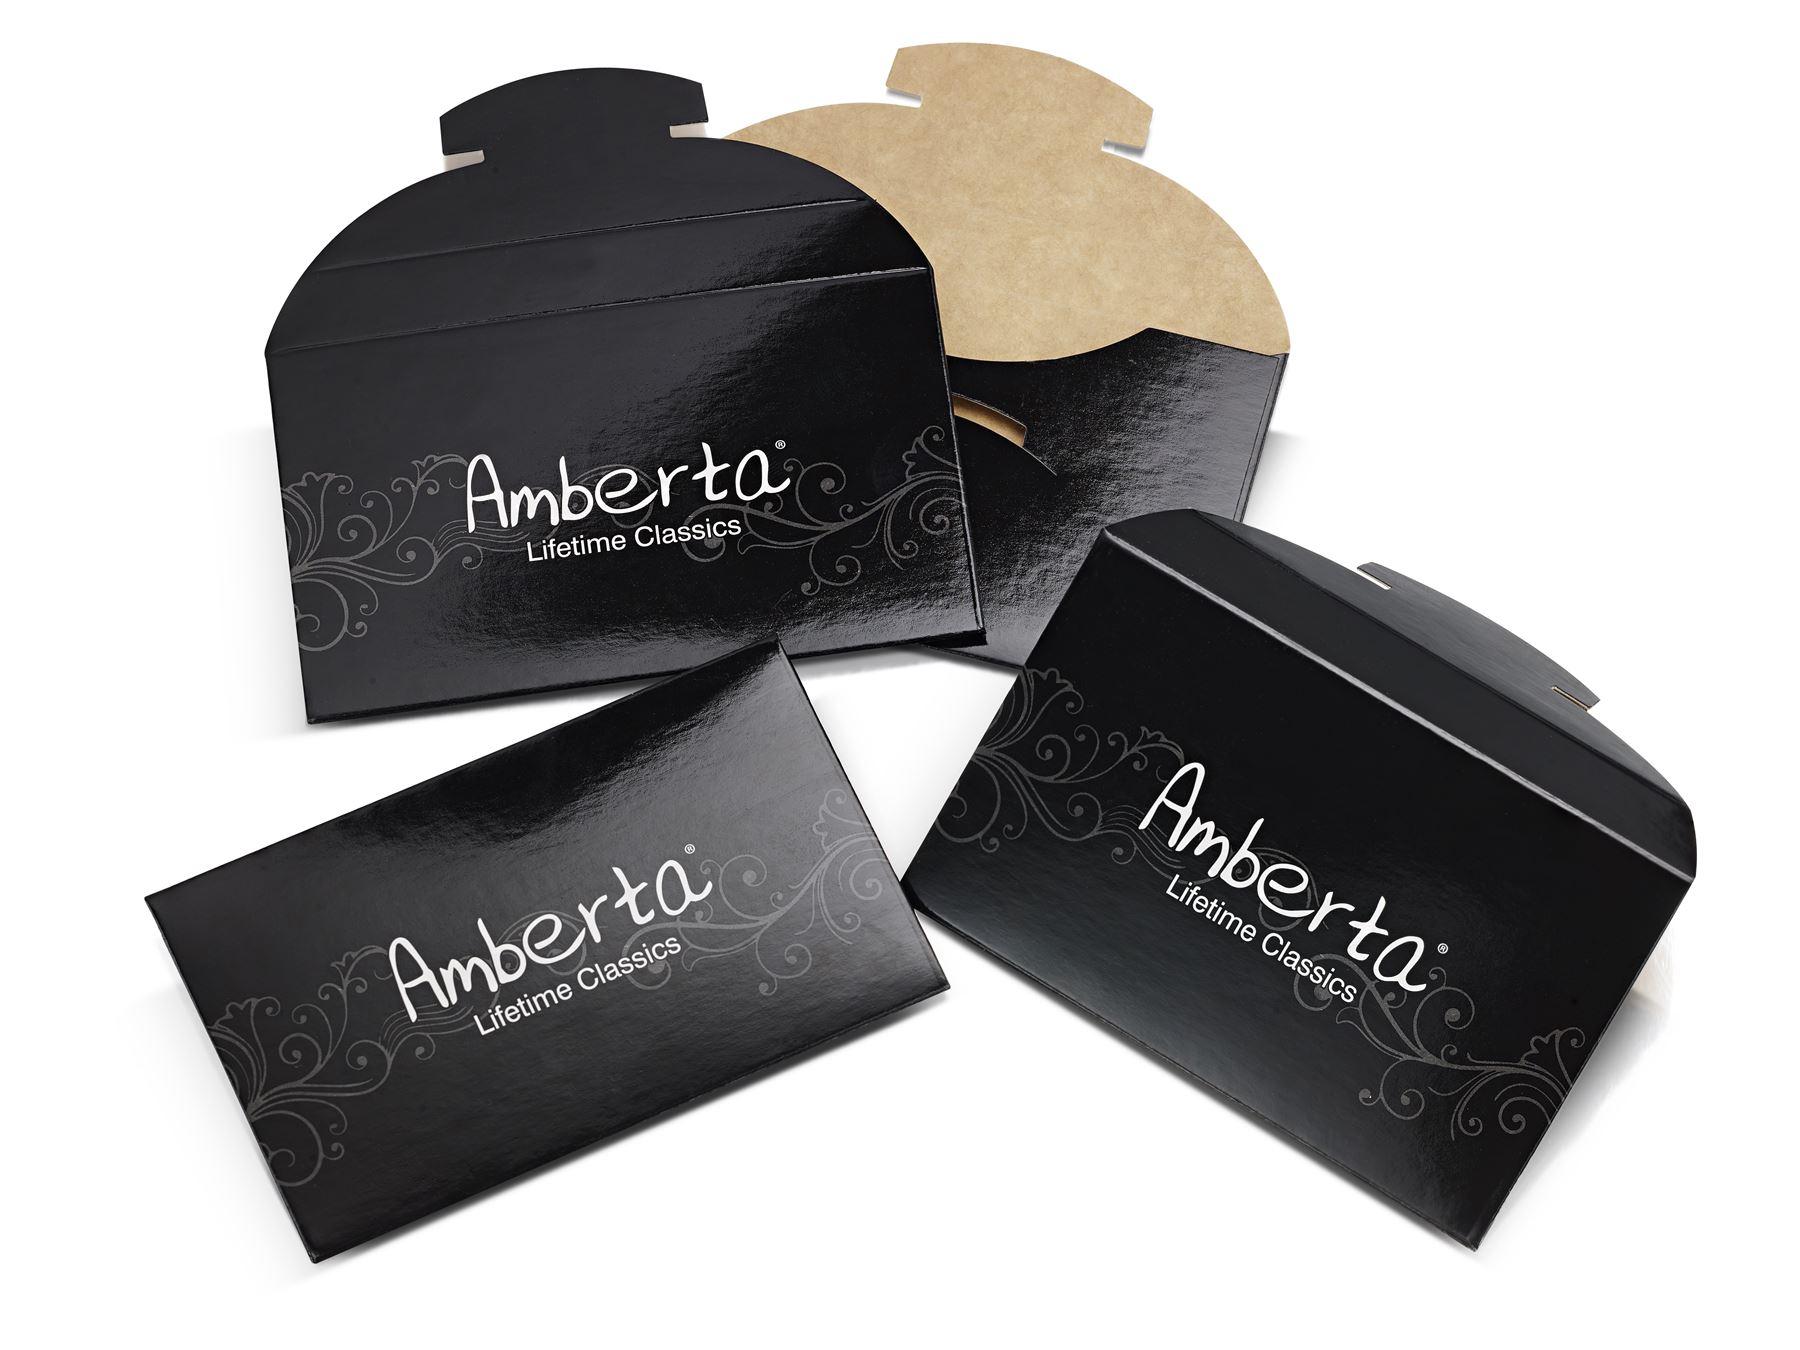 Amberta-Medallon-en-Fina-Plata-De-Ley-925-en-Formas-Diferentes-Para-Foto-y-Gemas miniatura 15